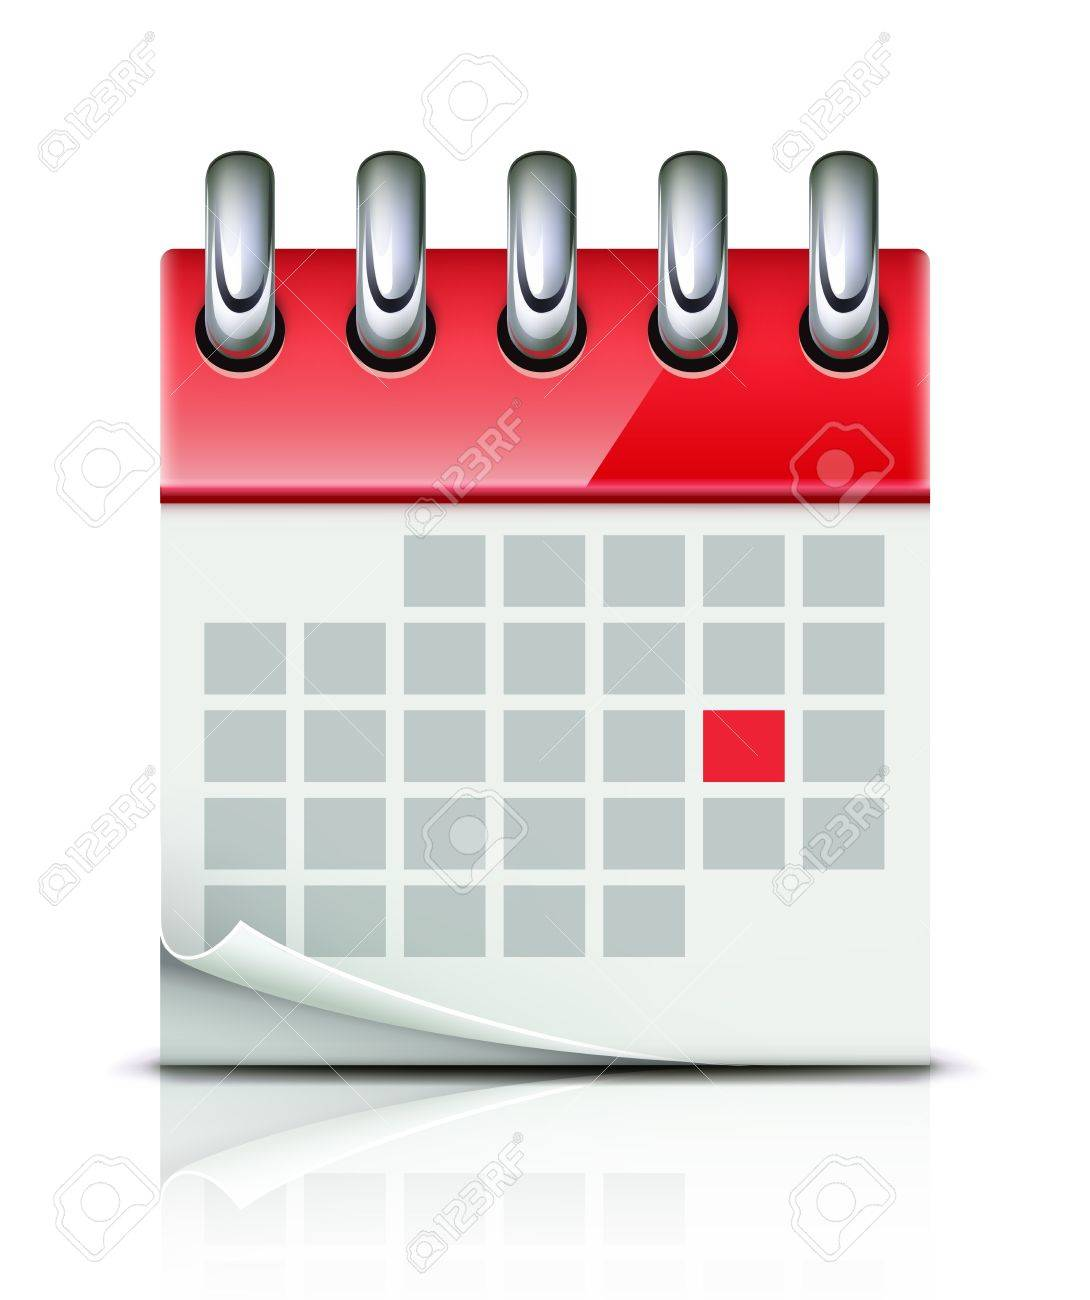 Illustration Calendrier.Illustration Of Detailed Beautiful Calendar Icon